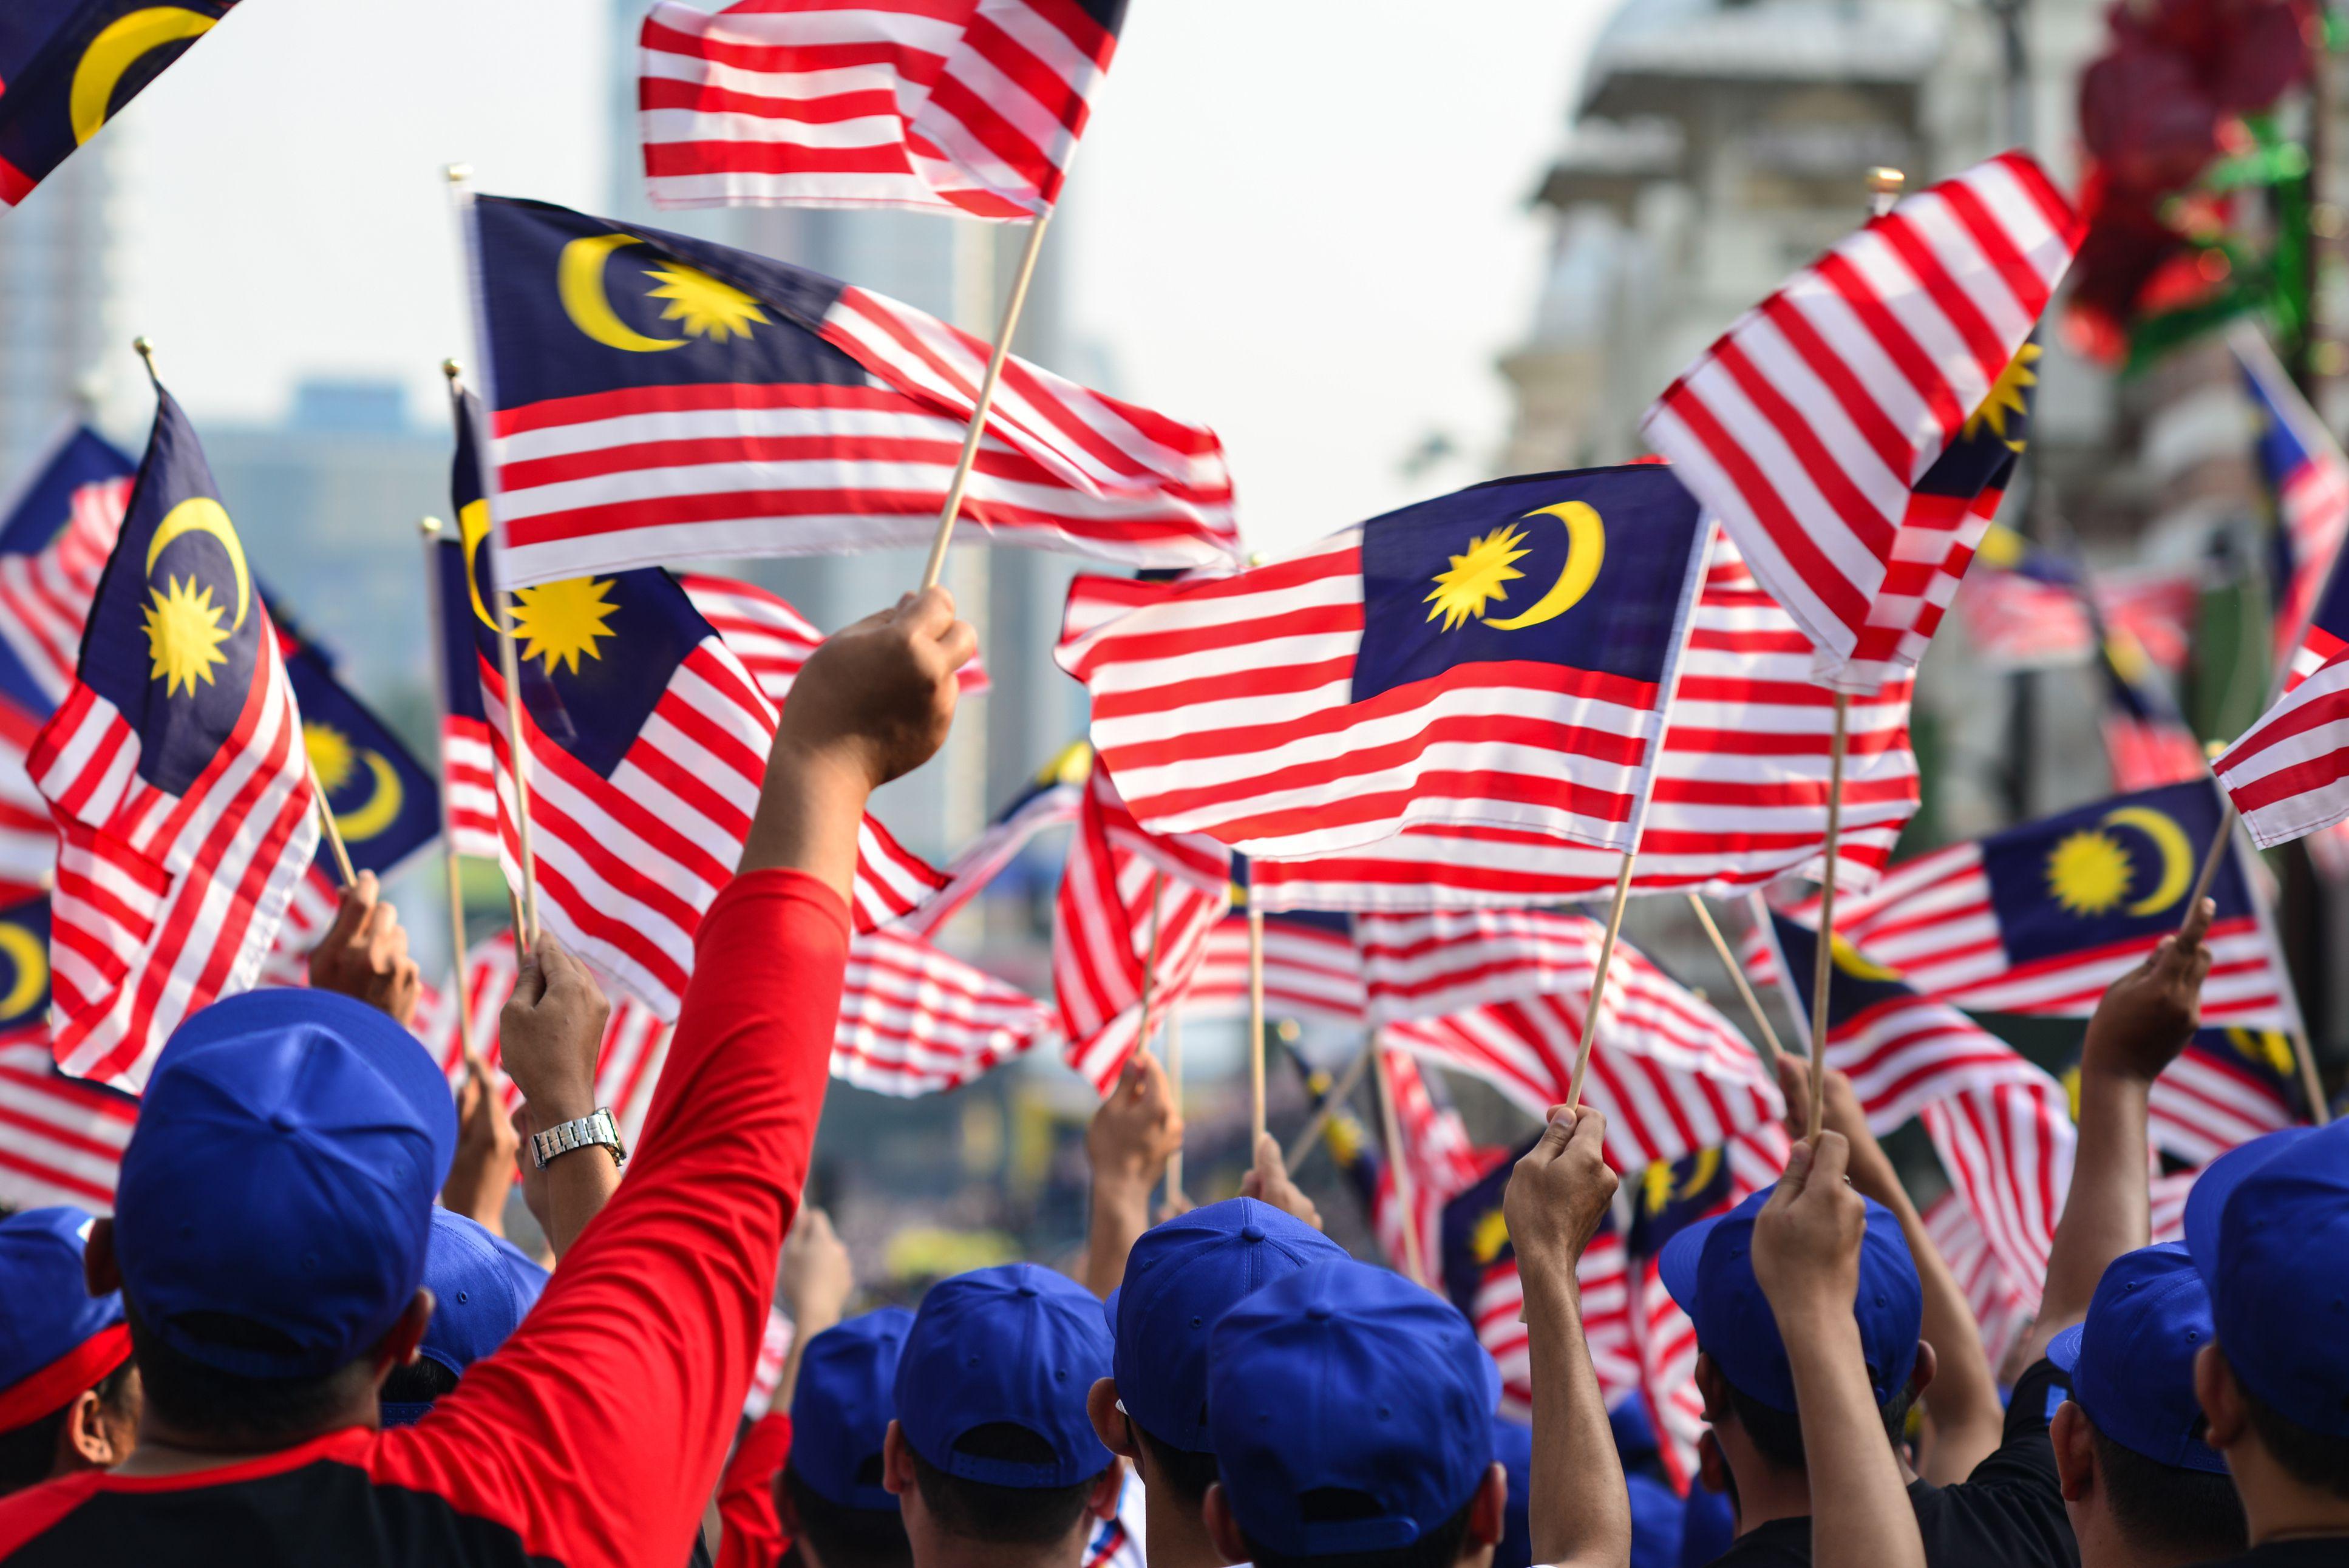 Malaysian flag waving during Malaysia Day celebrations